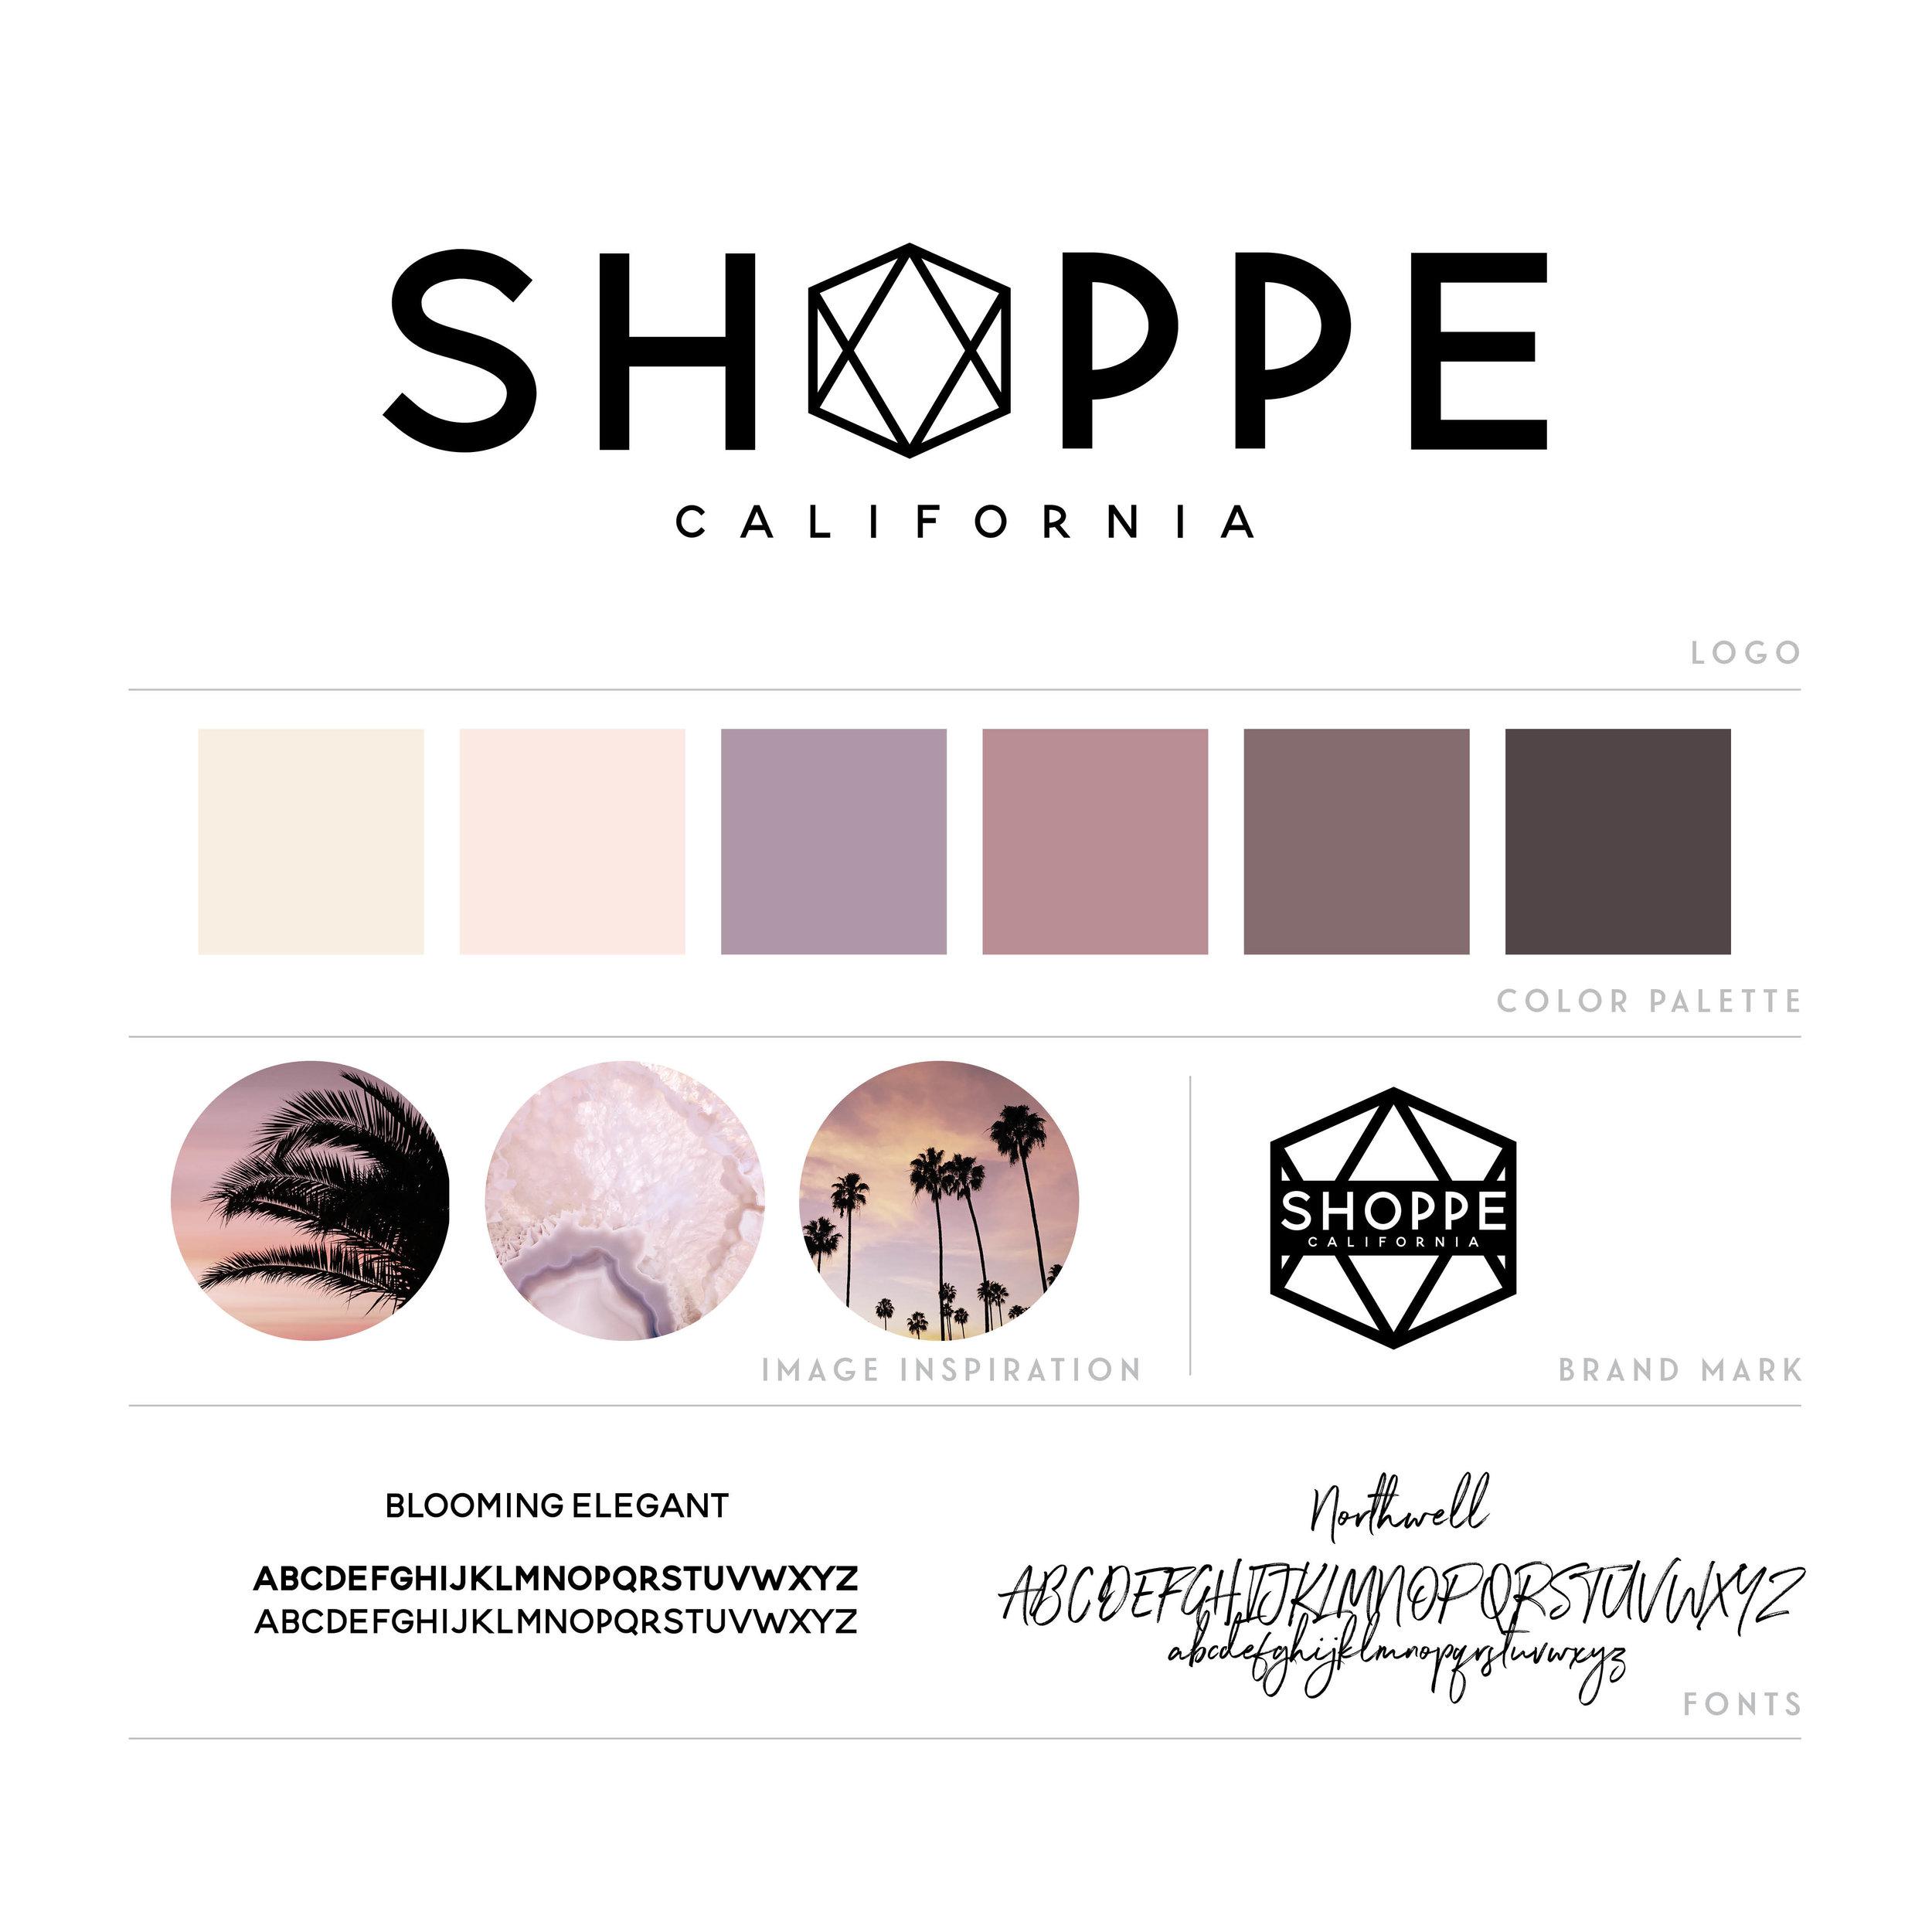 ShoppeCA_Branding Board_shoppeca.jpg